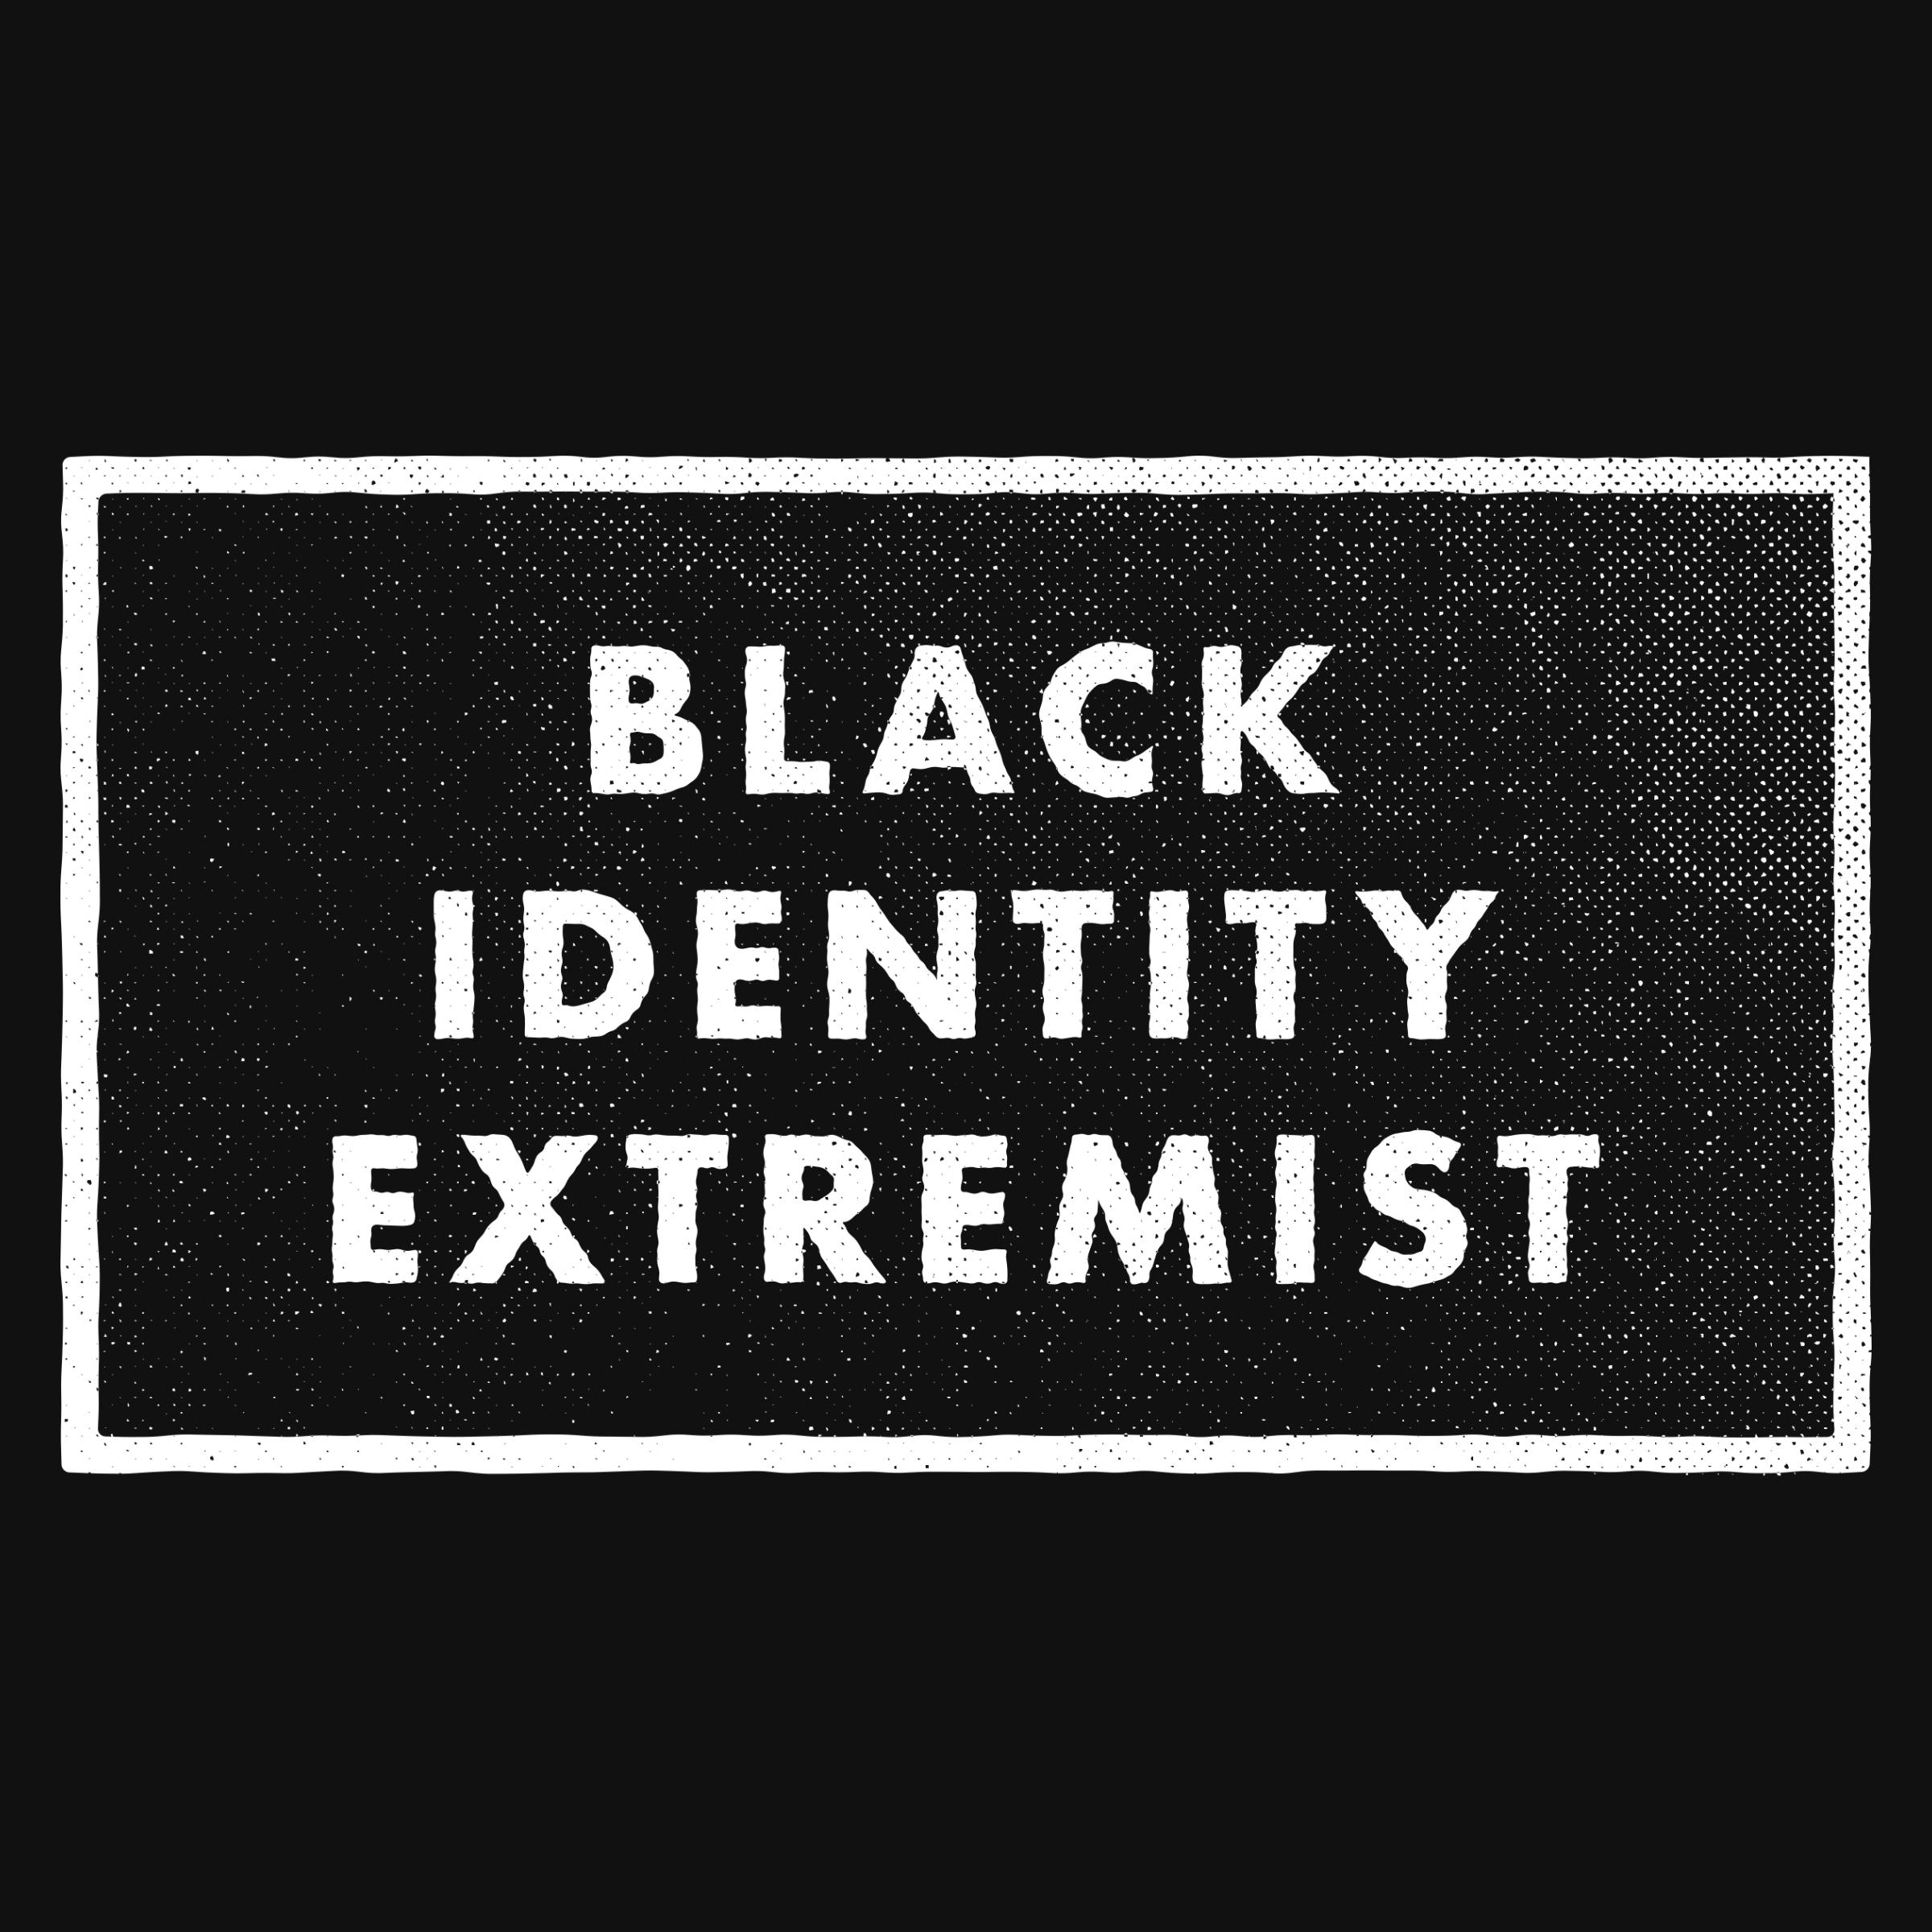 Black Identity Extremist